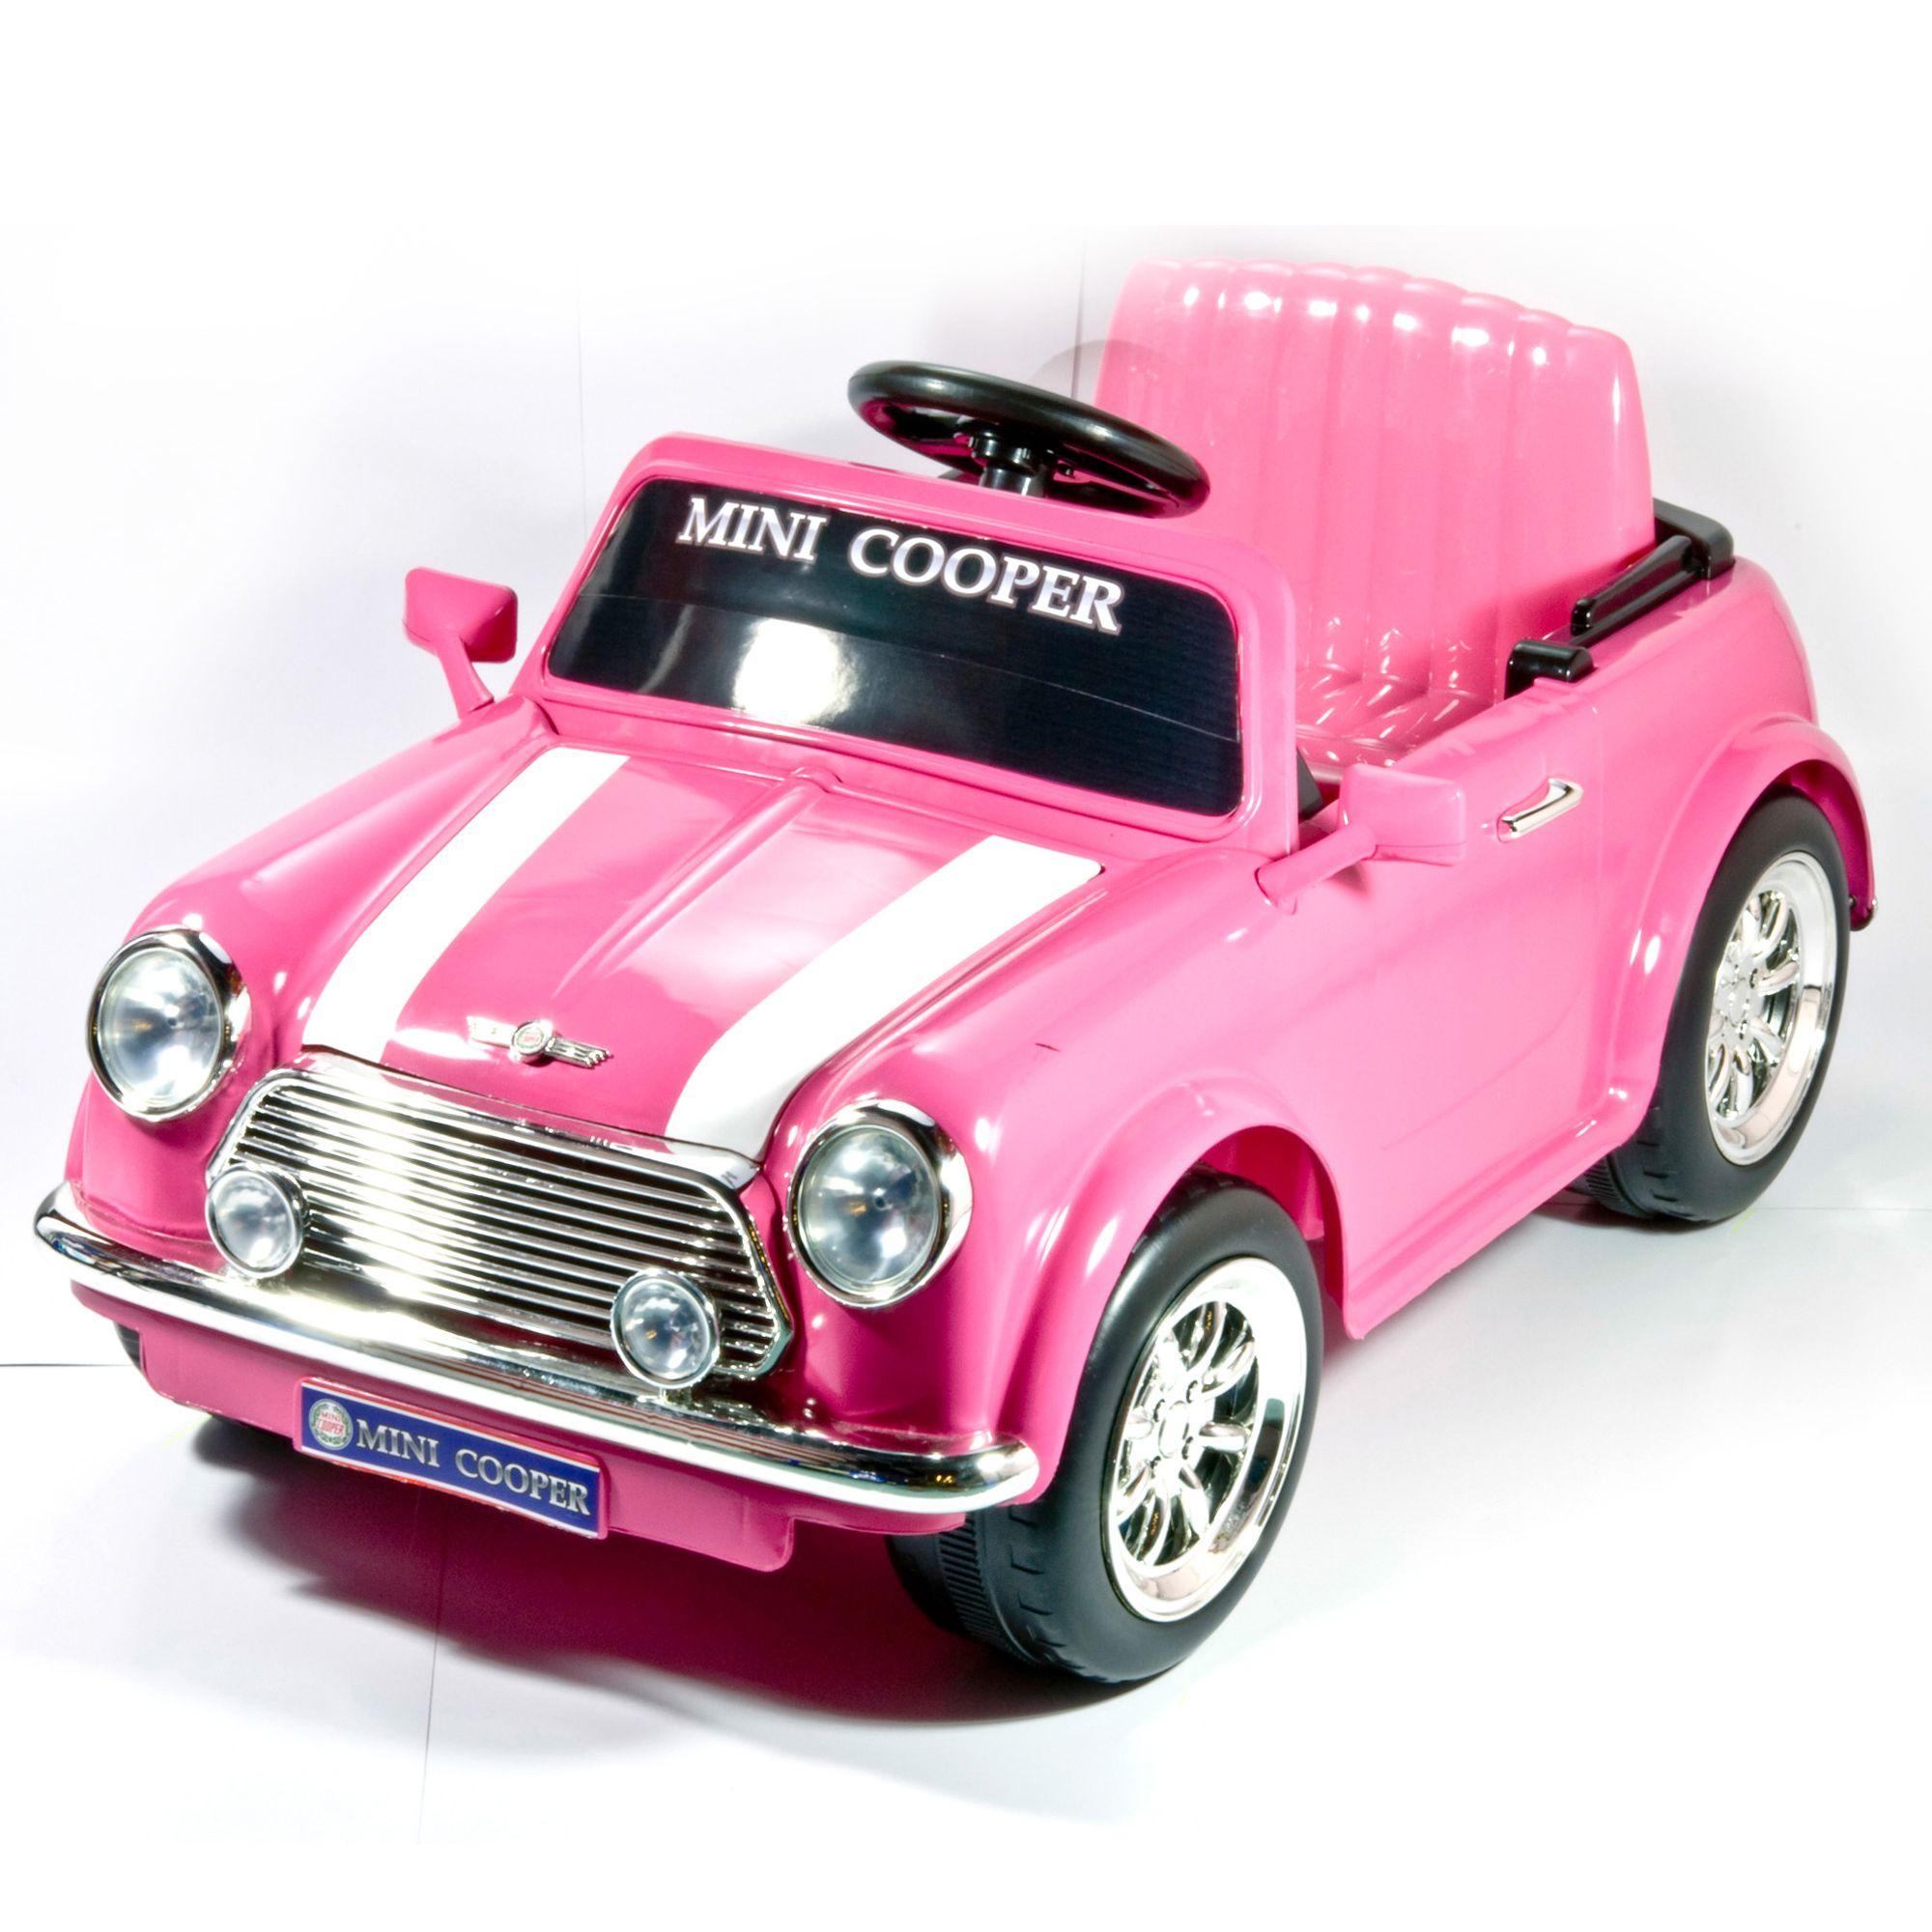 npl mini cooper pink. Black Bedroom Furniture Sets. Home Design Ideas